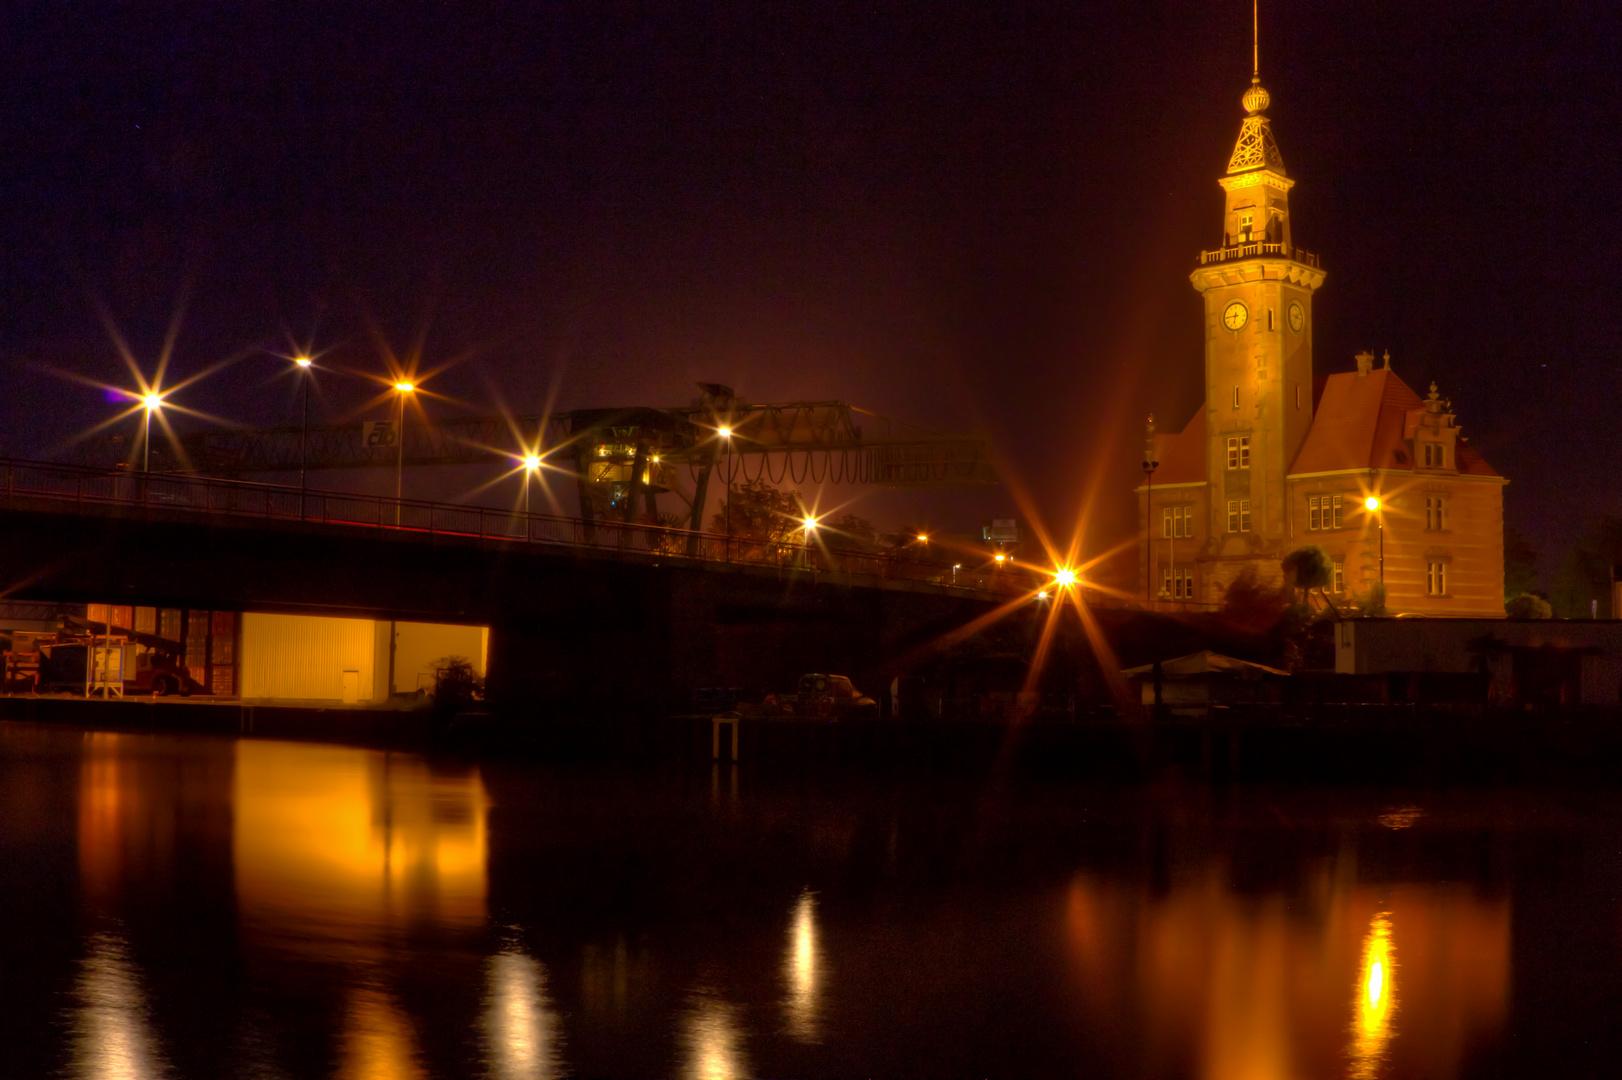 -Hafenamt Dortmund-